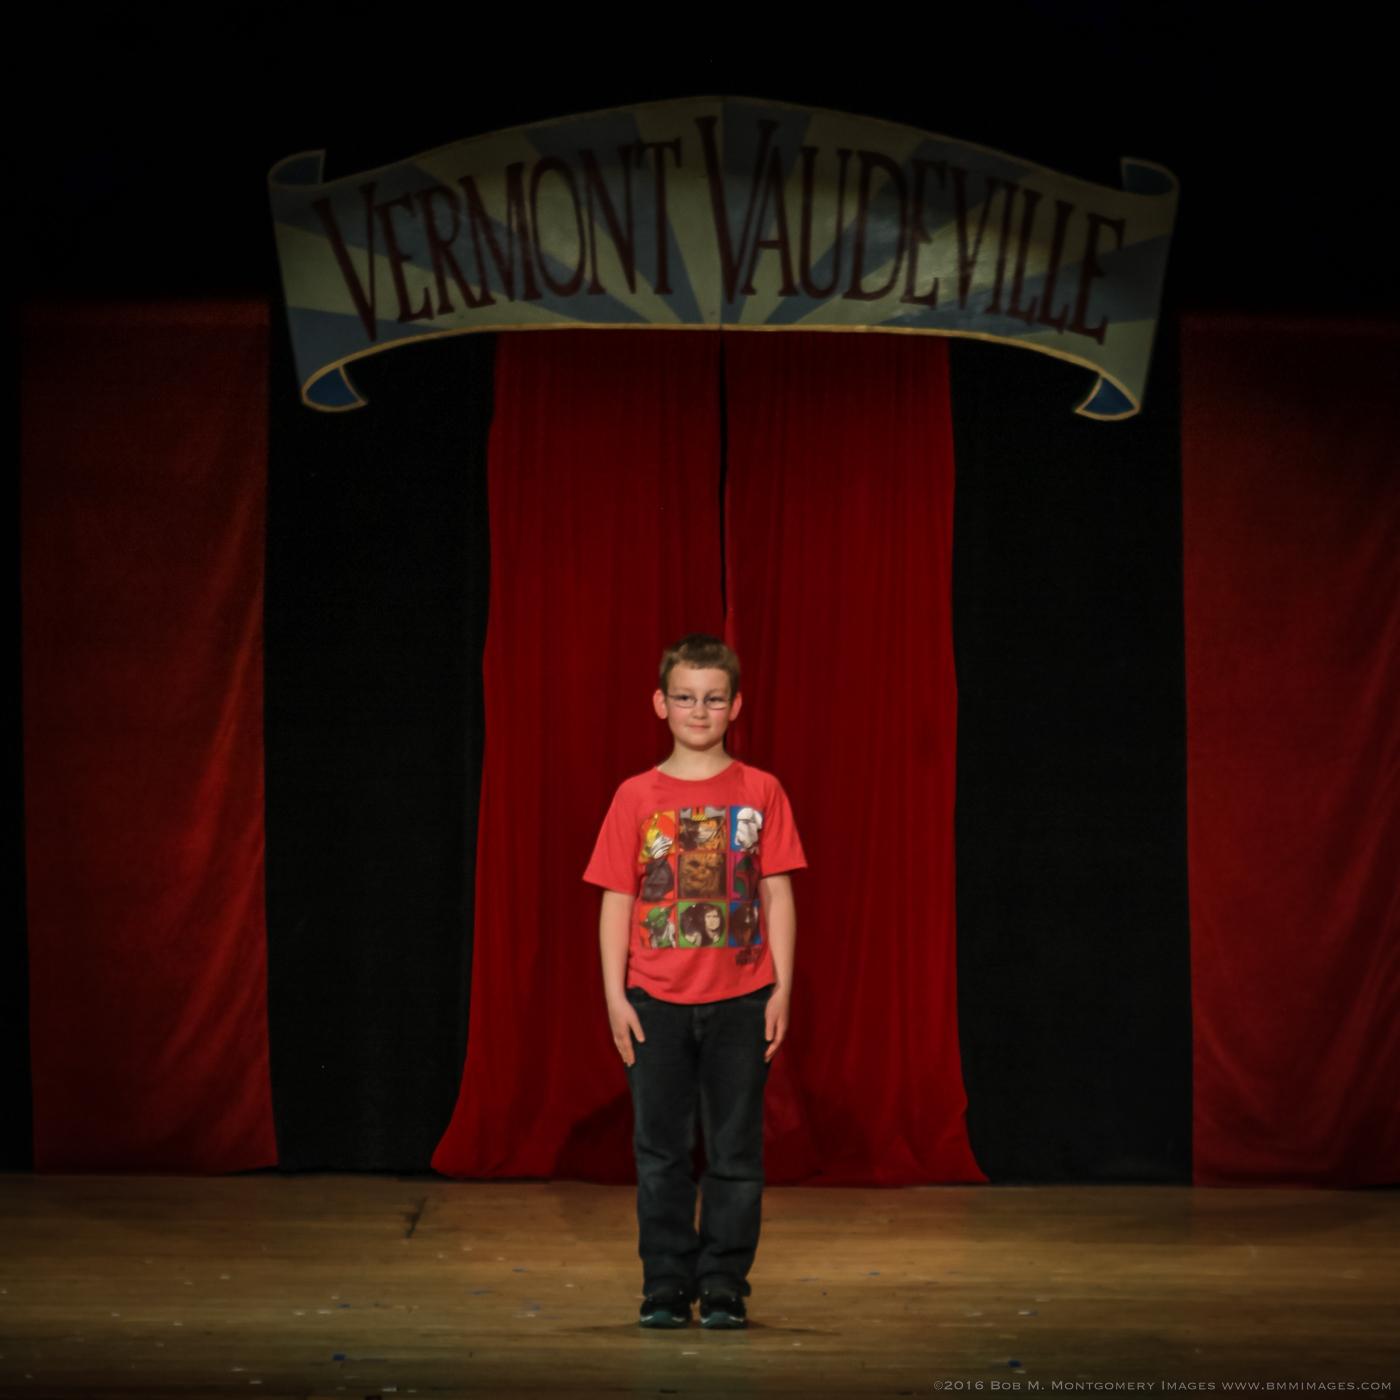 Vermont Vaudeville 20160513 - 0121.jpg